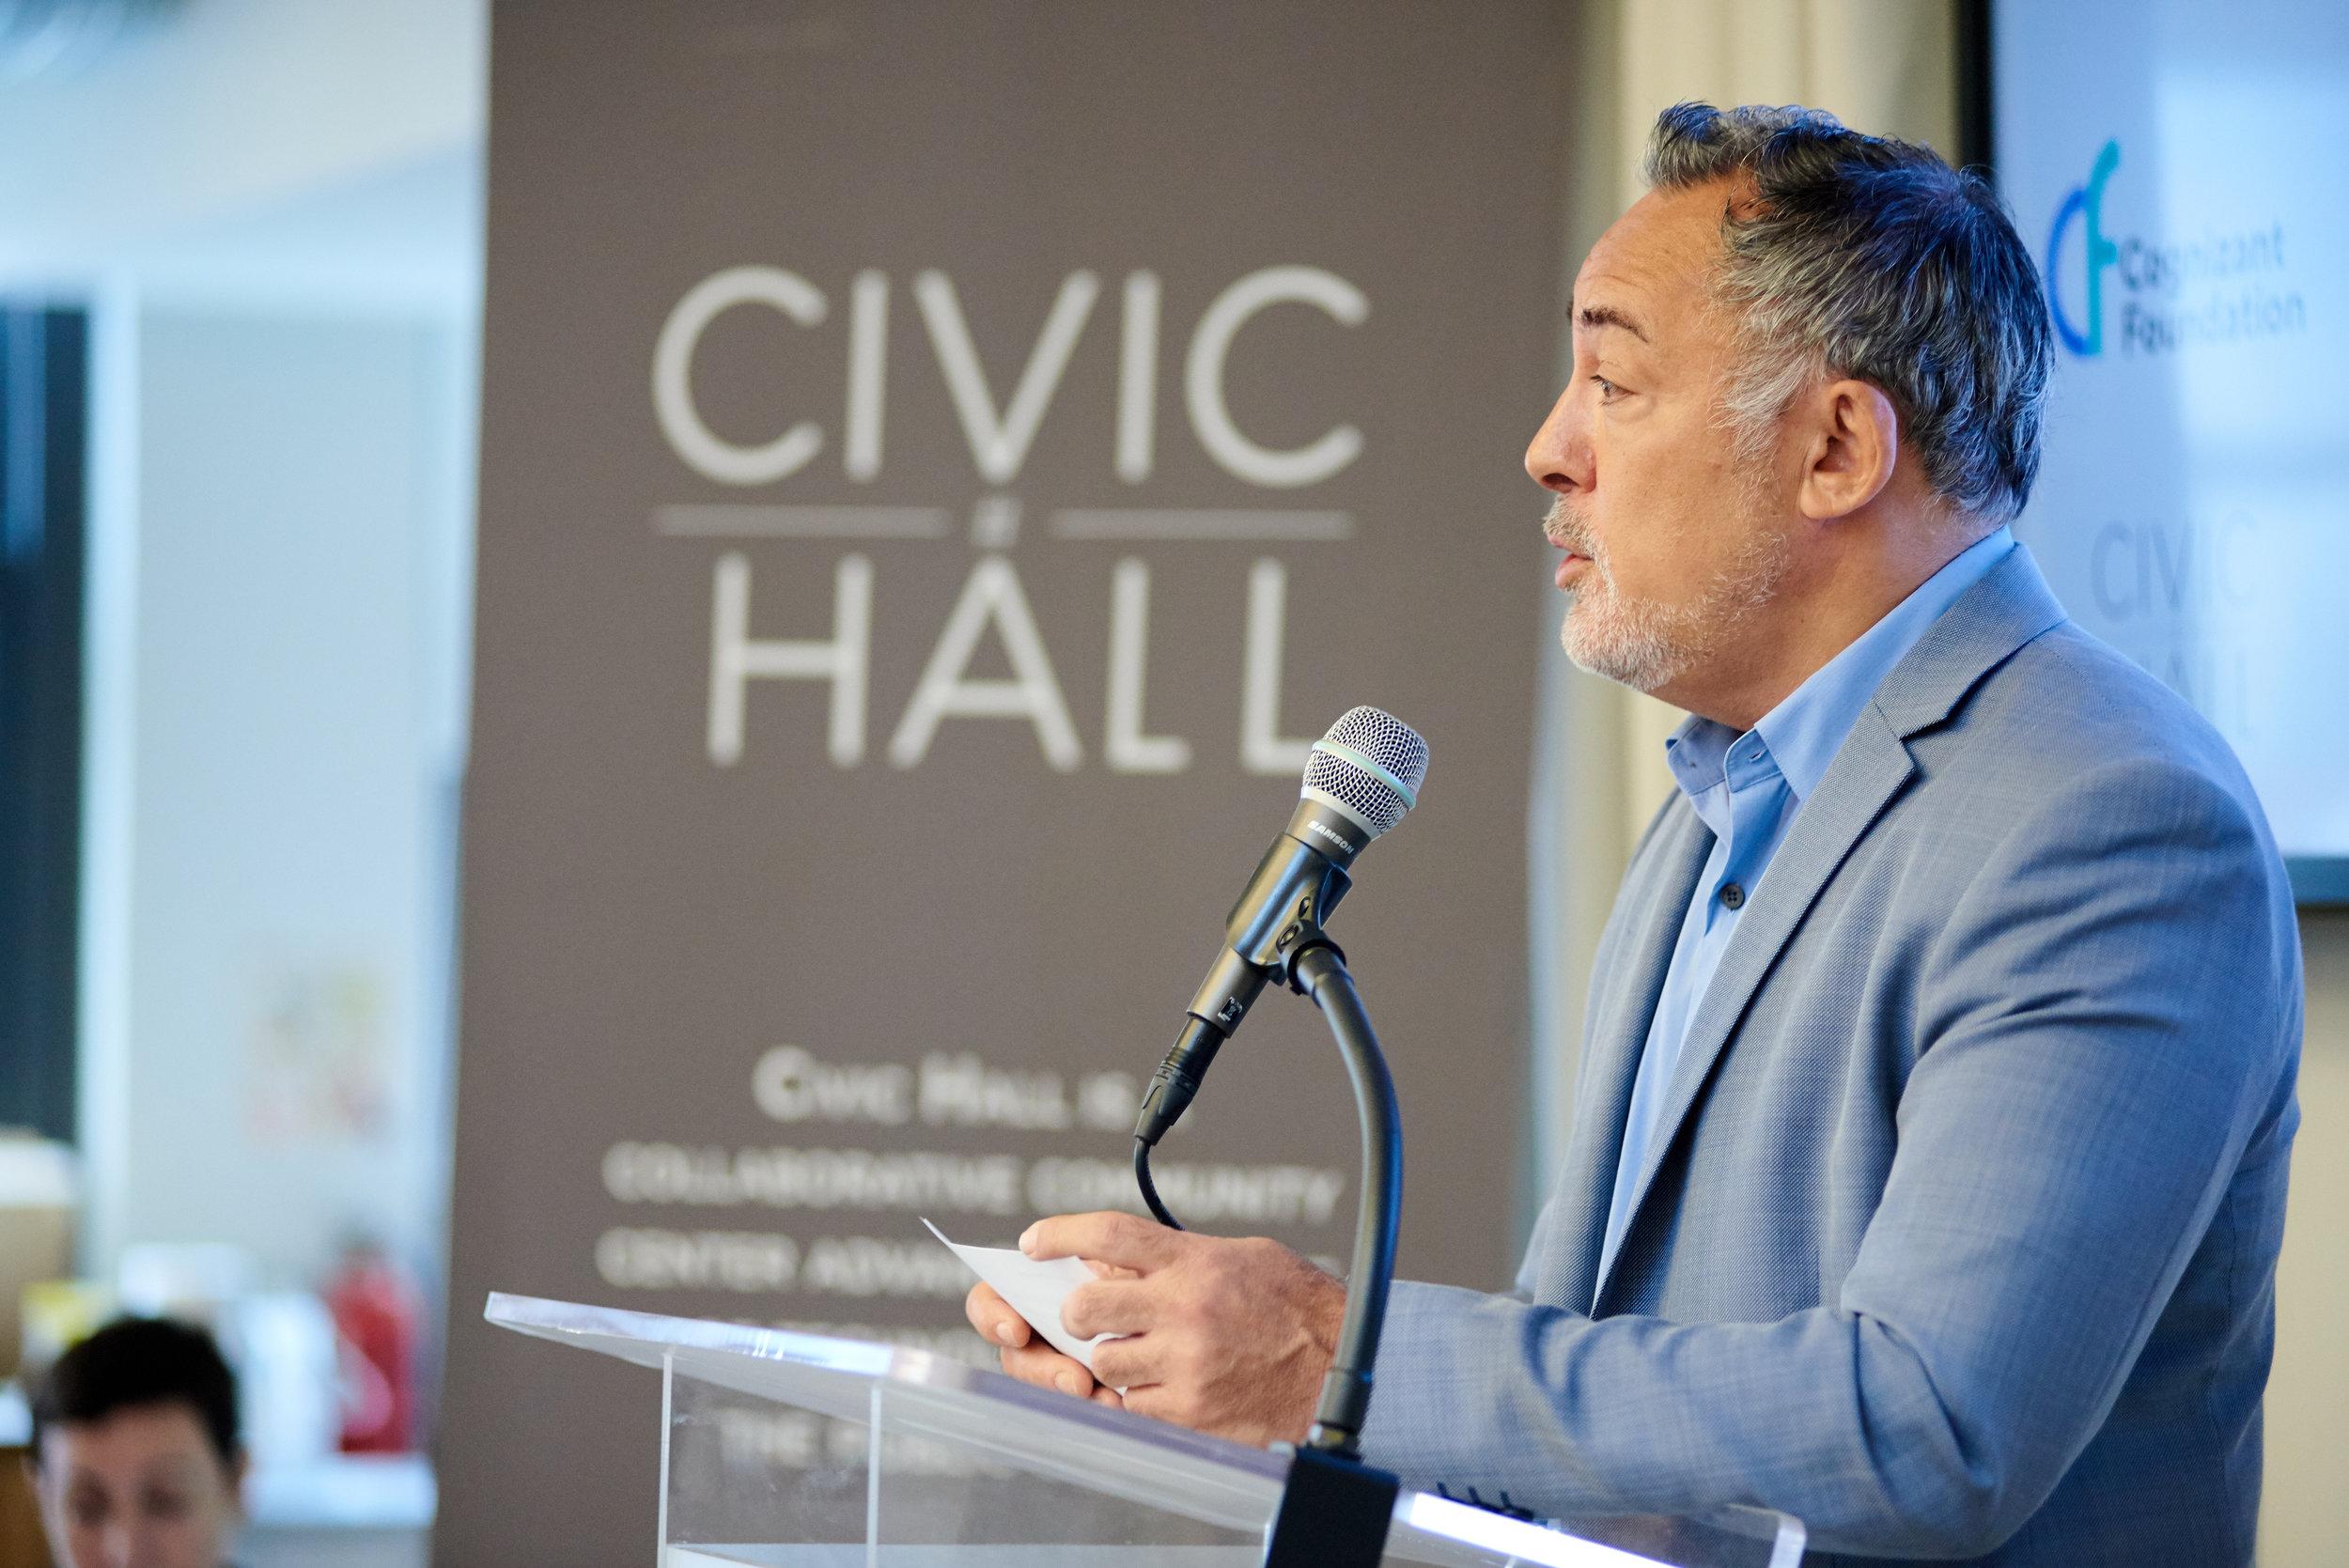 CivicHall.jpg